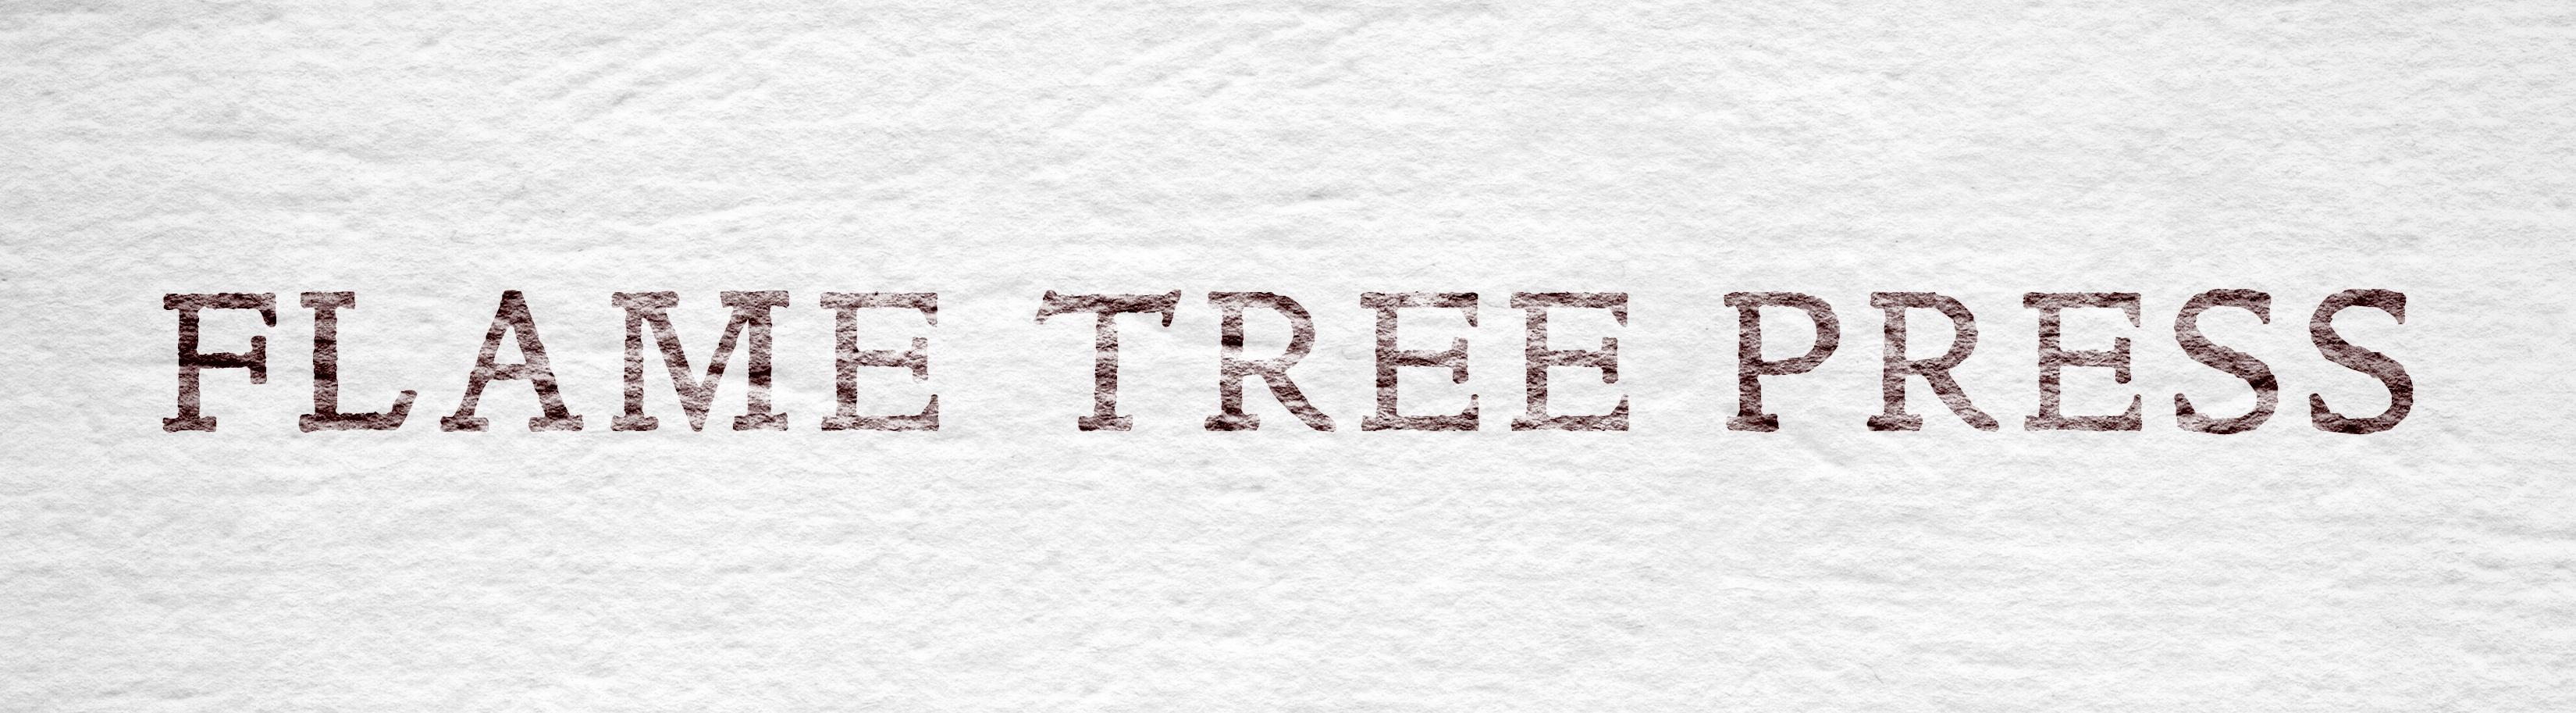 Flame_Tree_Press.jpg